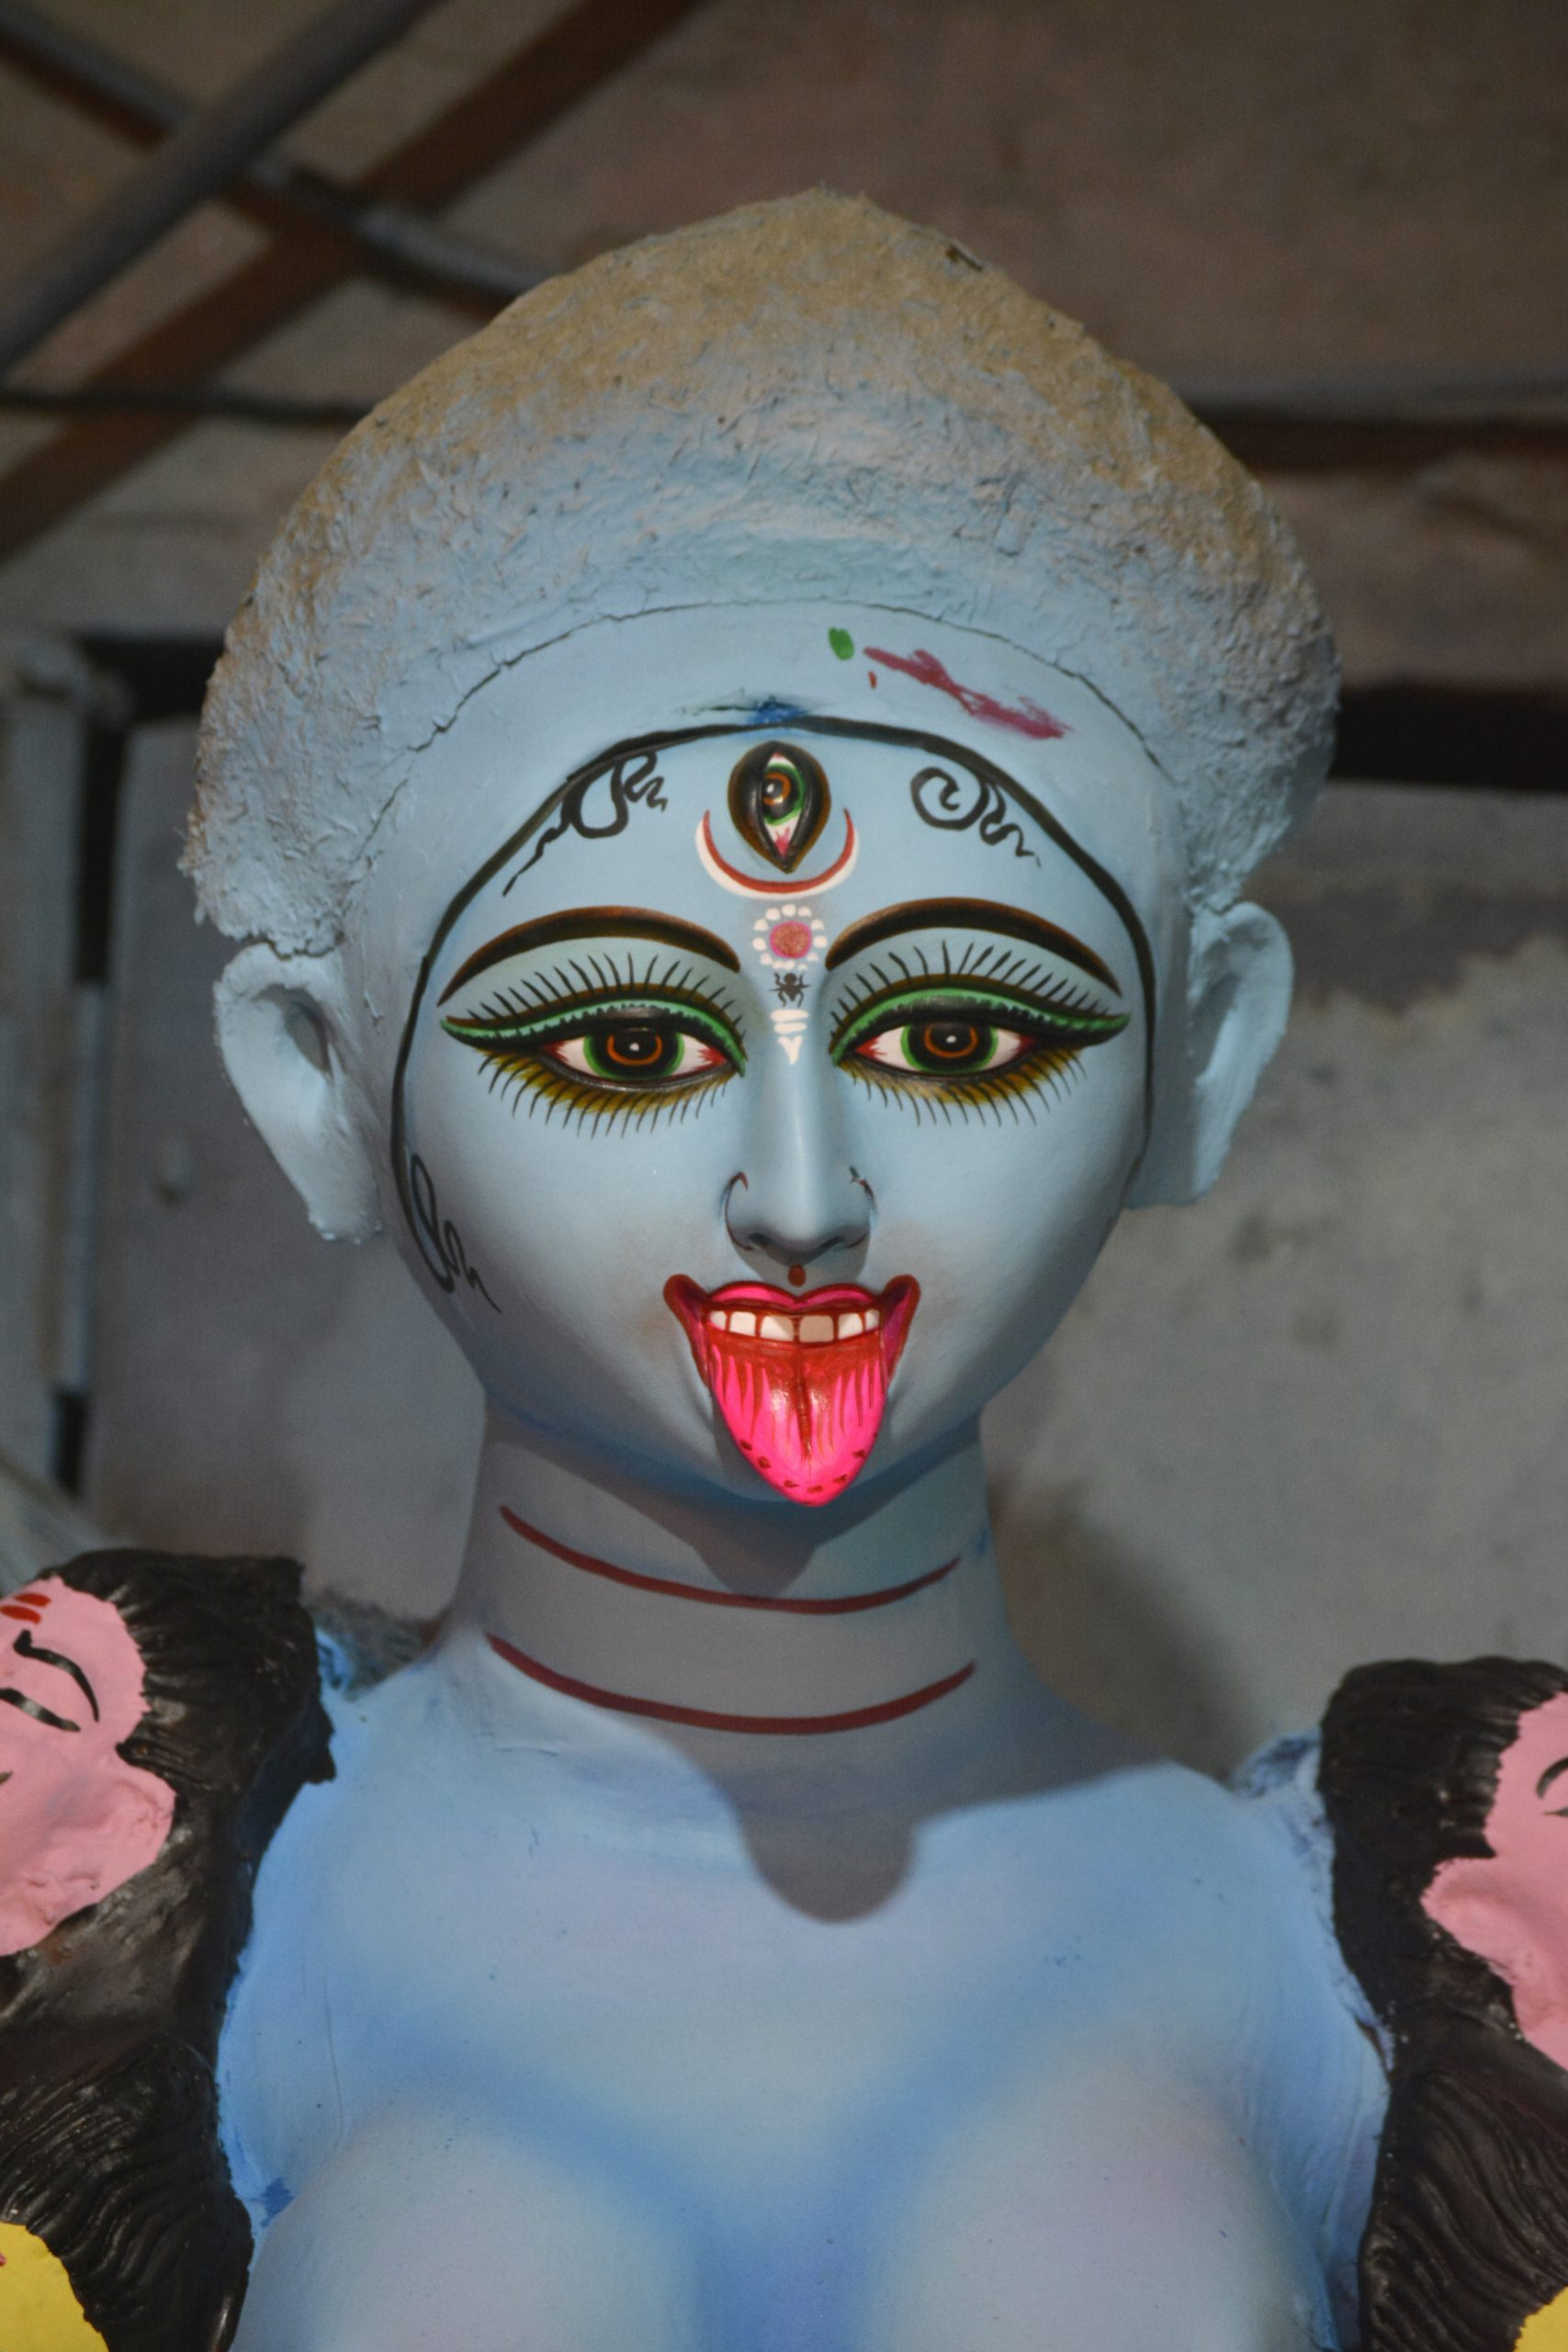 A clay idol of Hindu Goddess